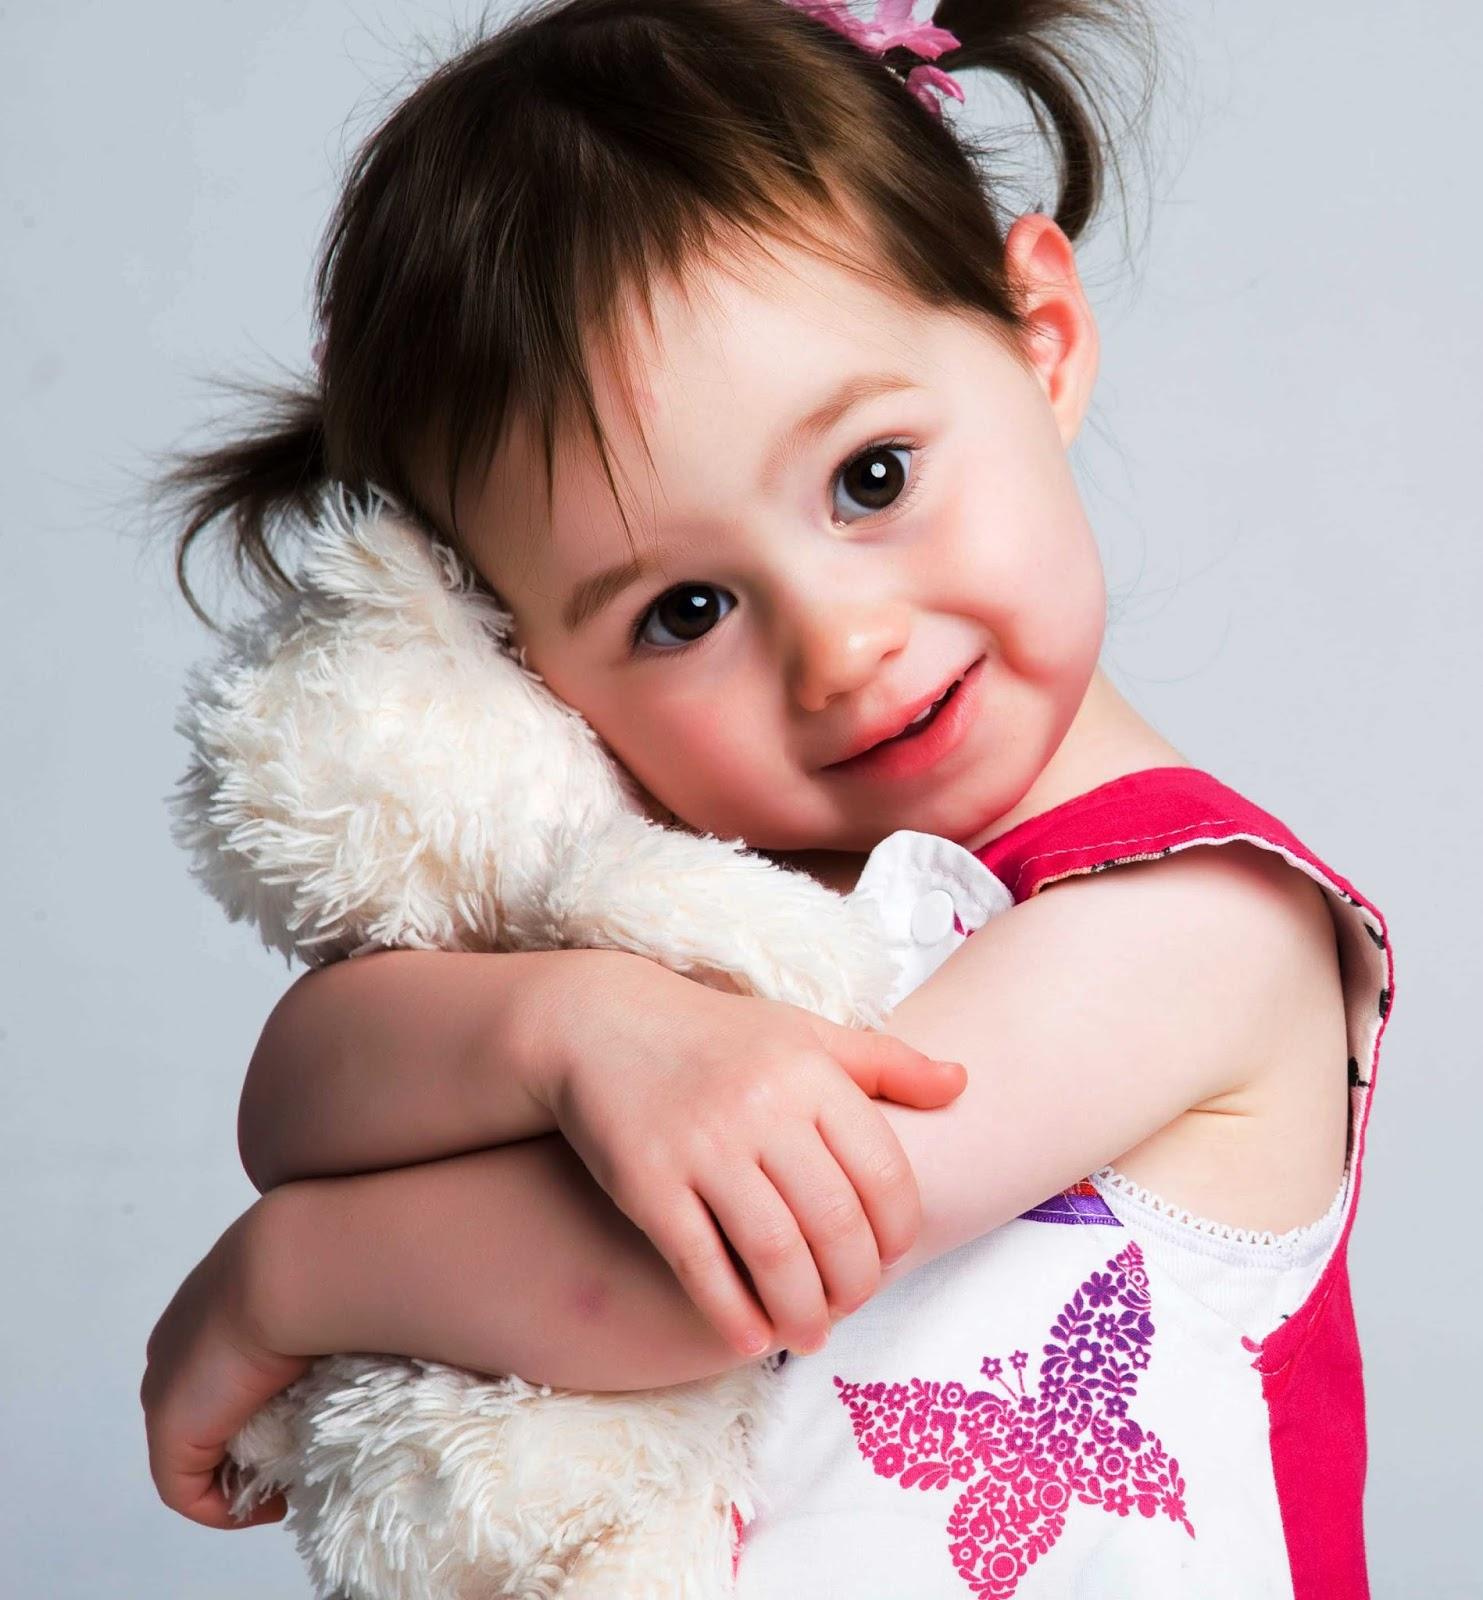 smiling baby girl image